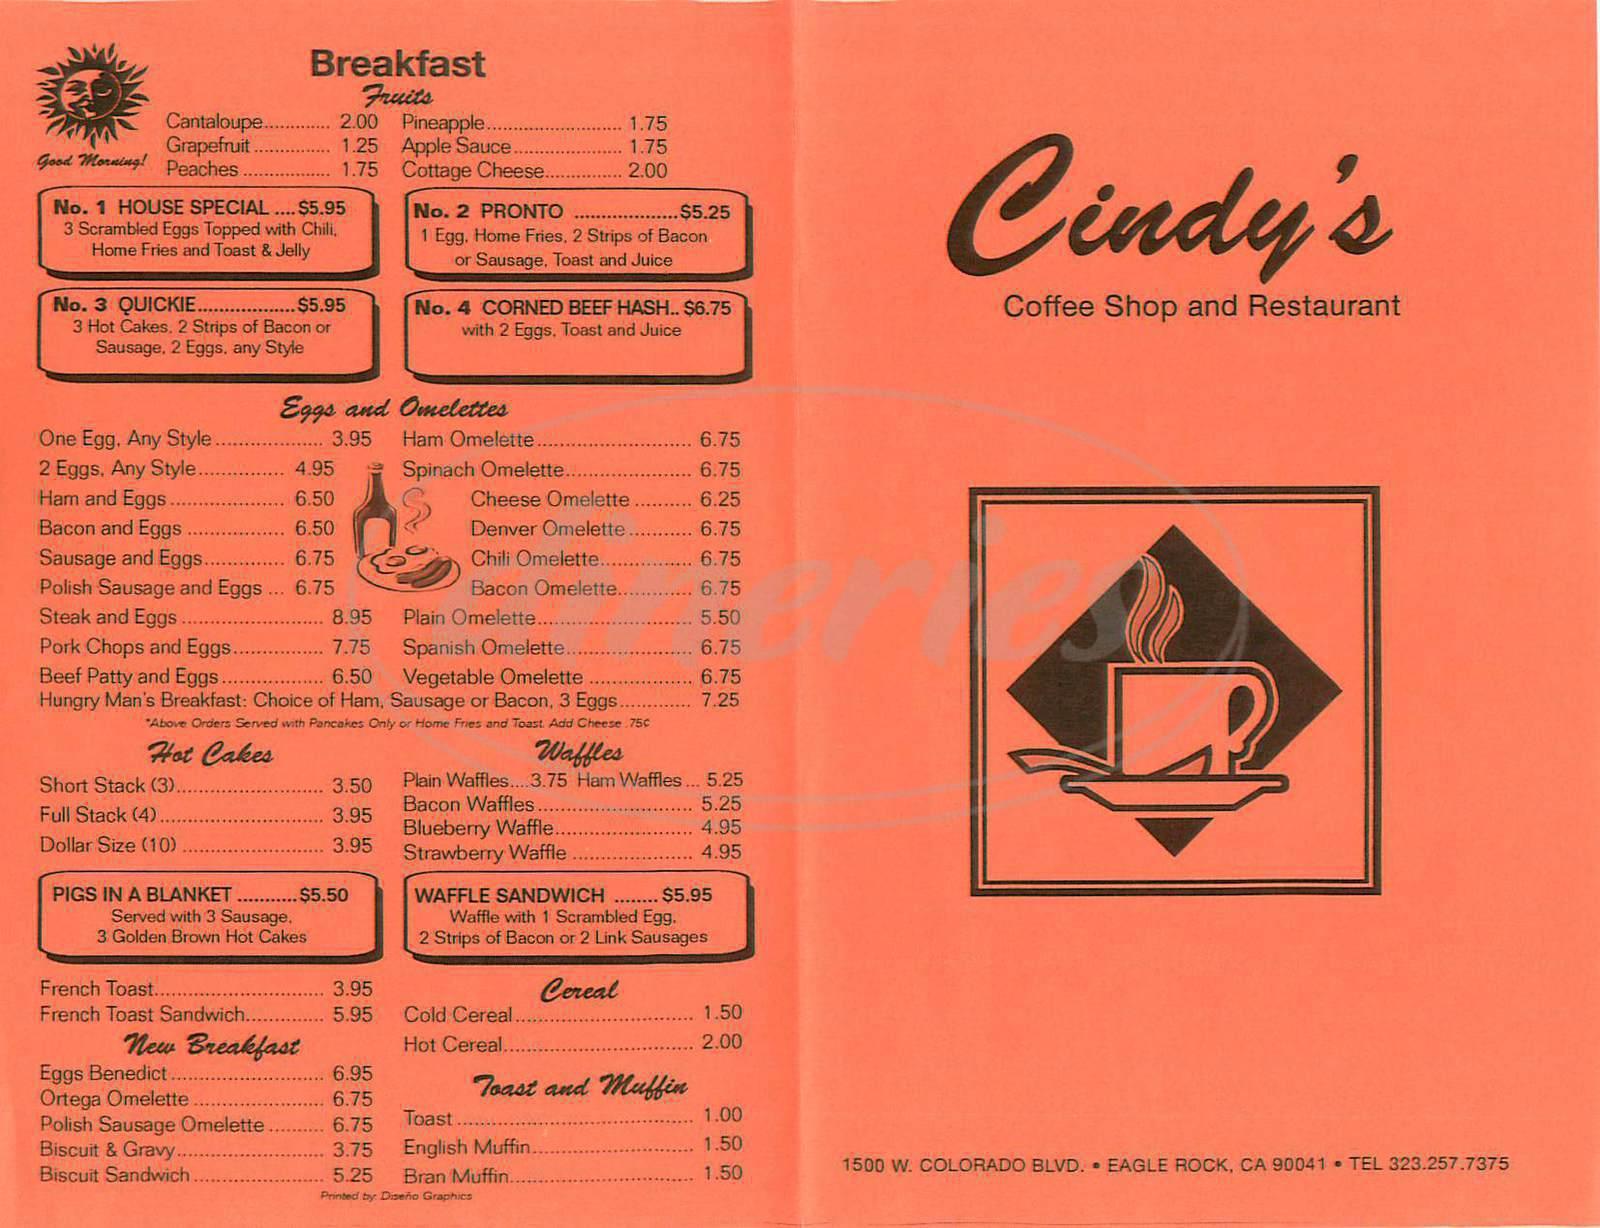 menu for Cindys Coffee Shop